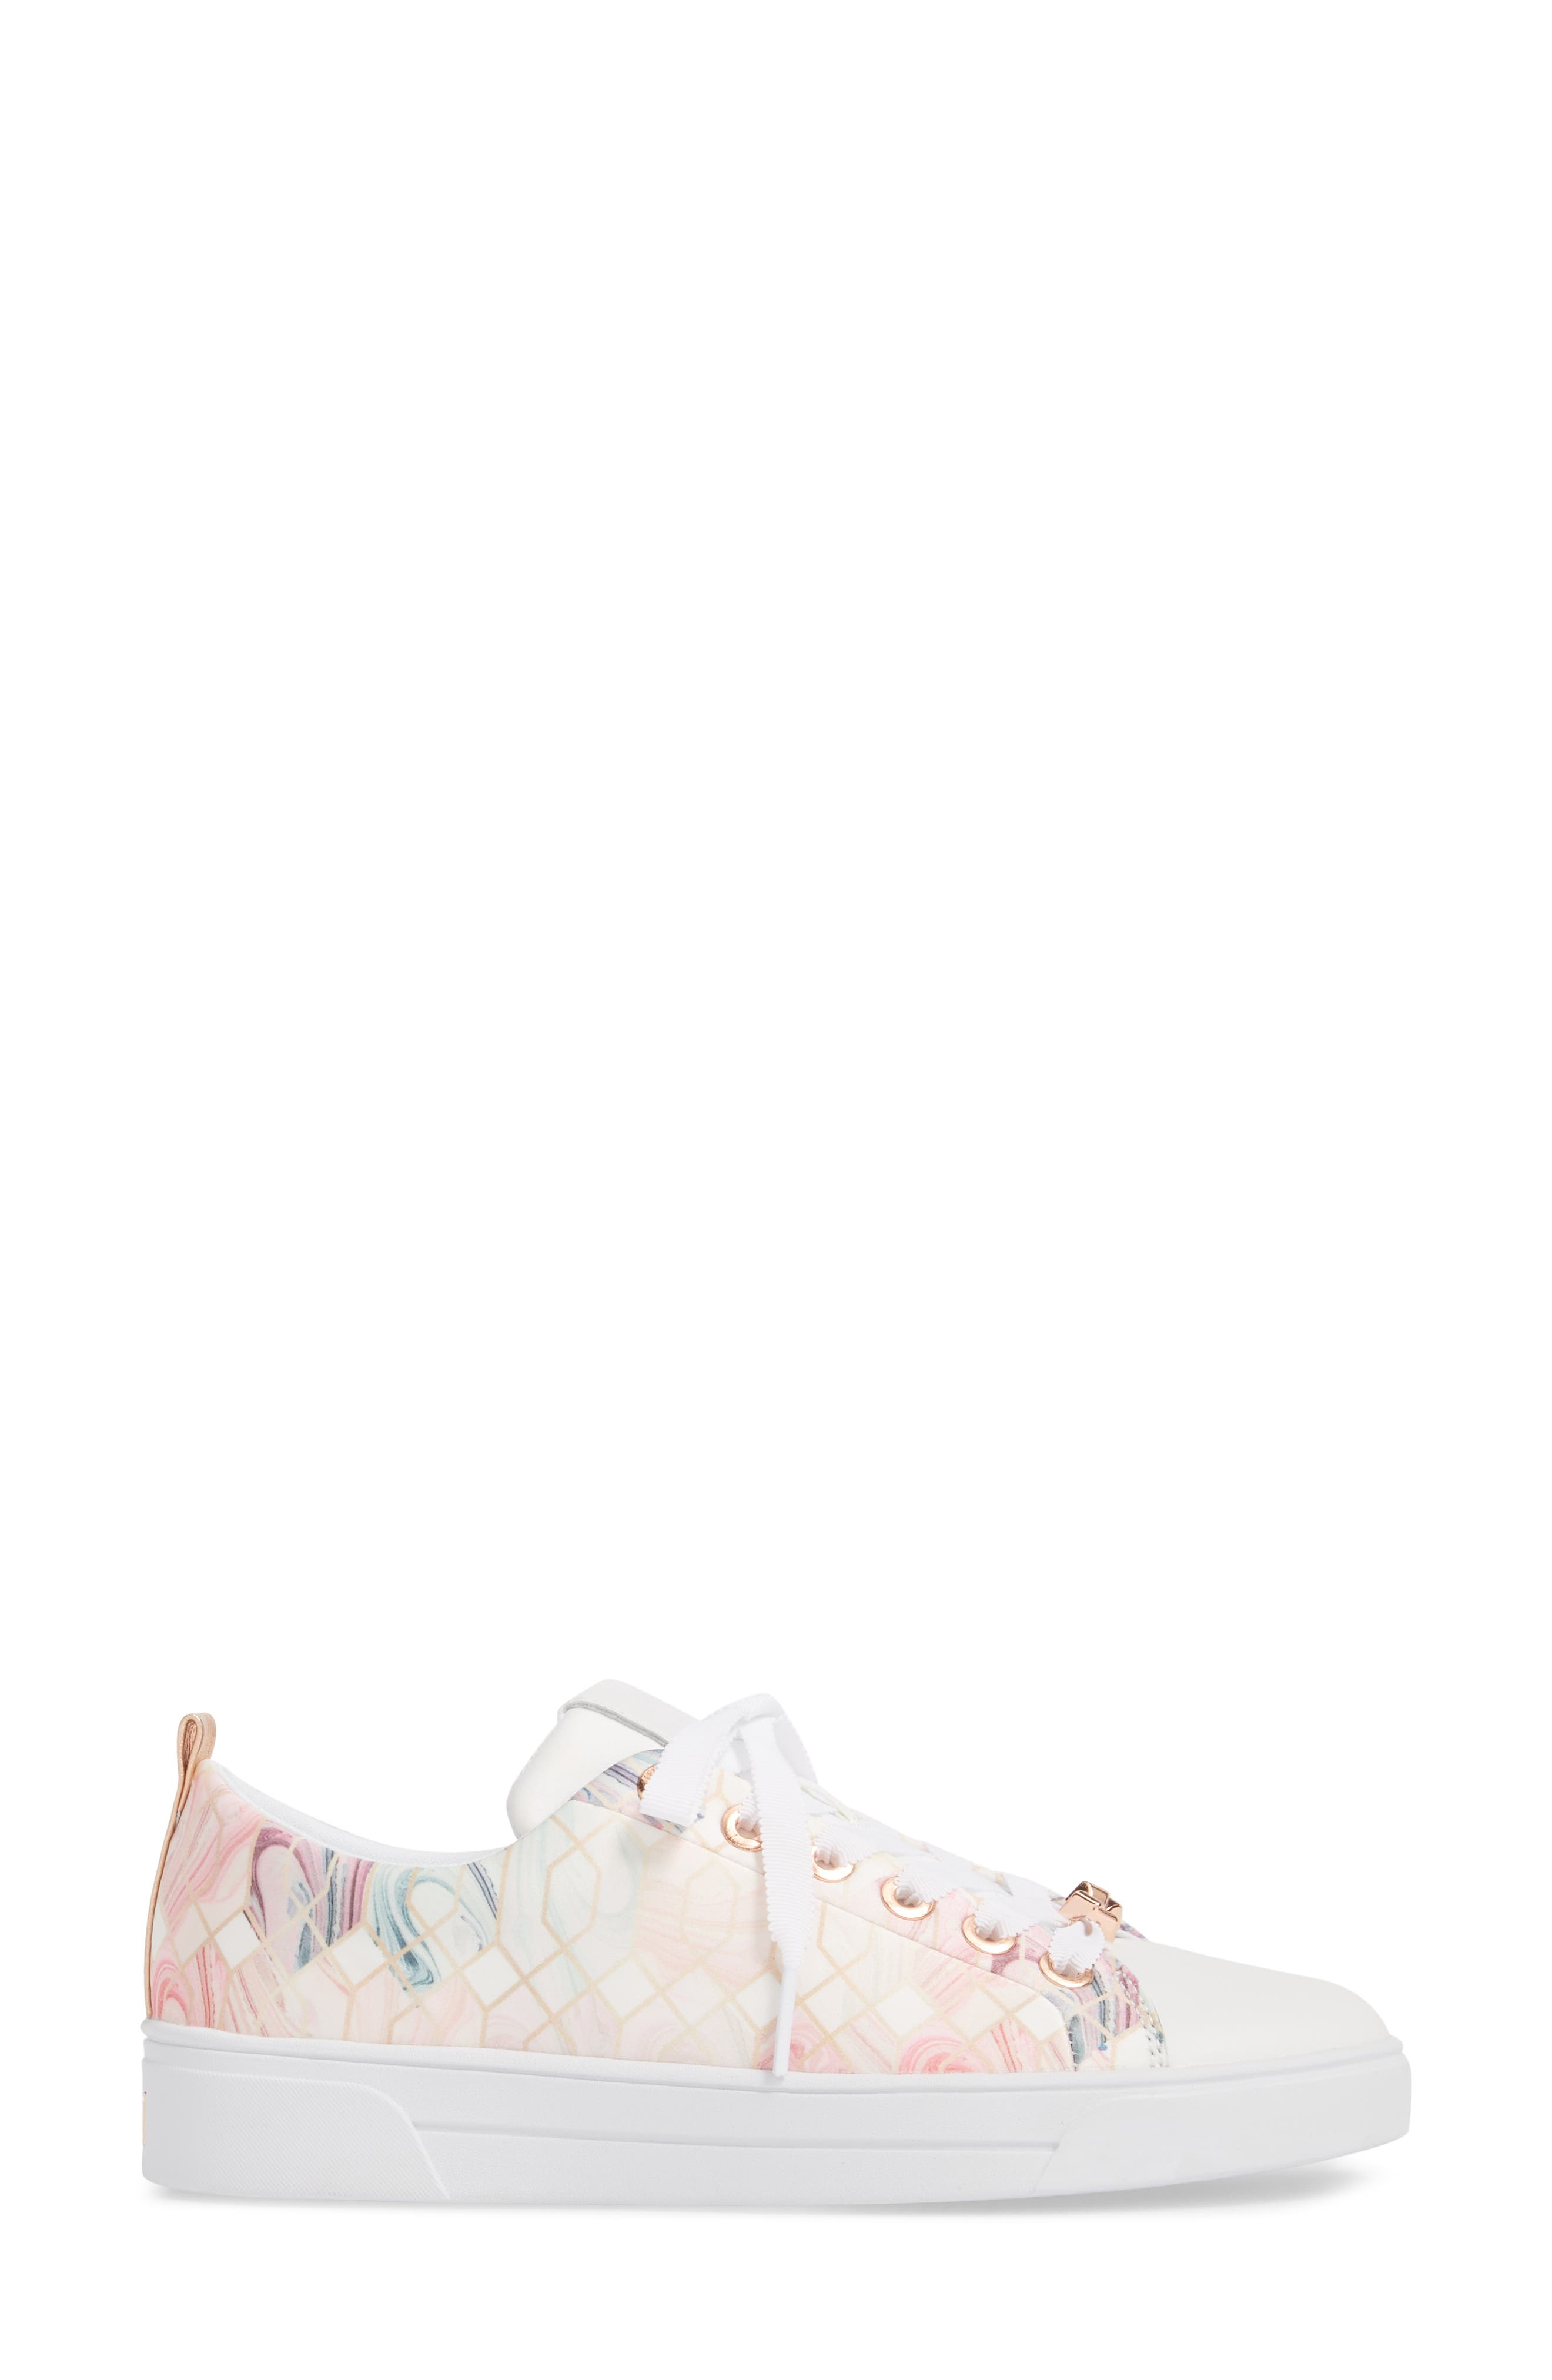 Ahfira Sneaker,                             Alternate thumbnail 3, color,                             Sea Of Clouds Print Fabric